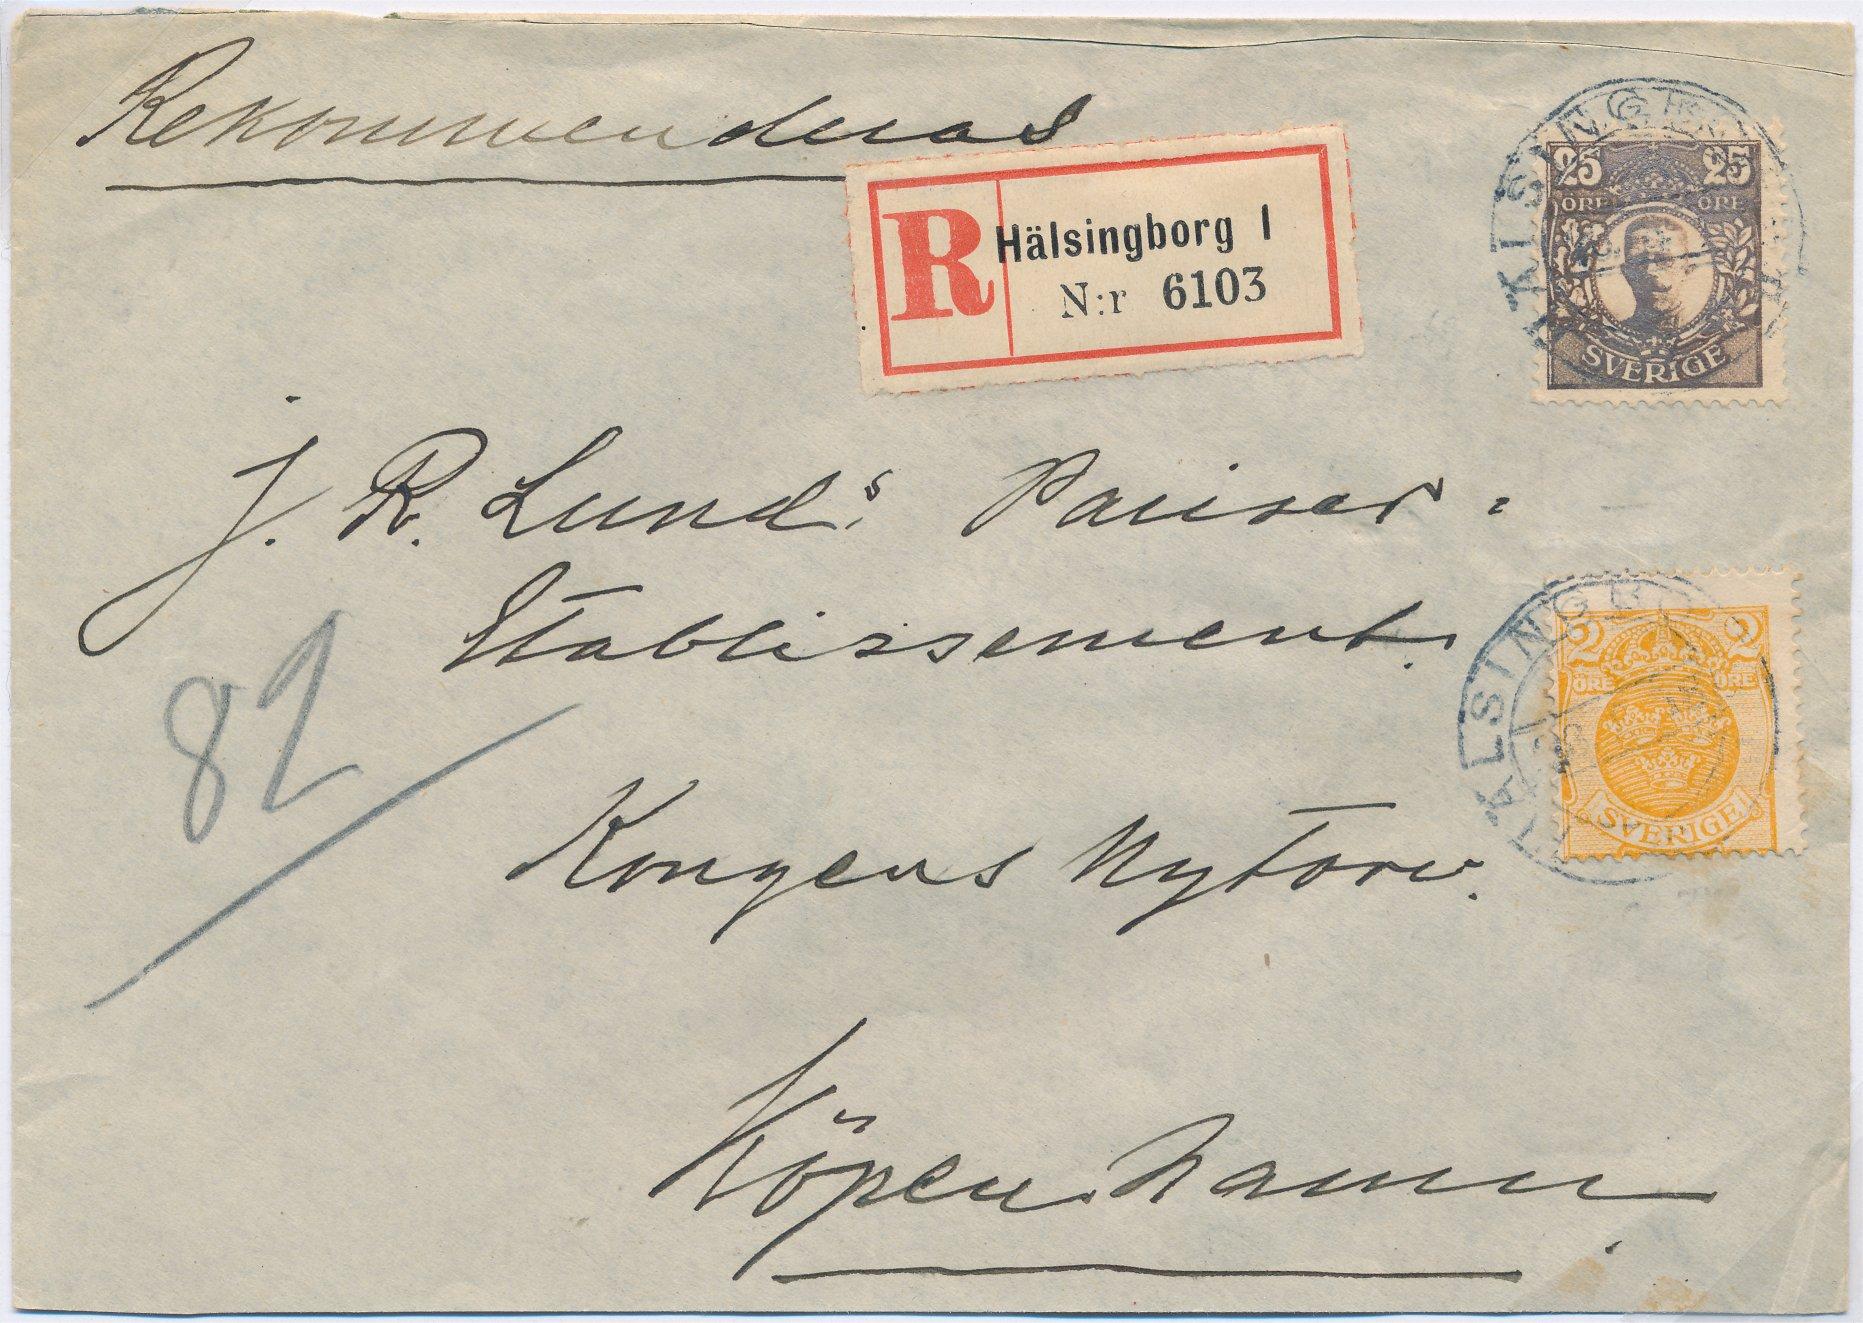 27rek_halsingborg_23_8_1918